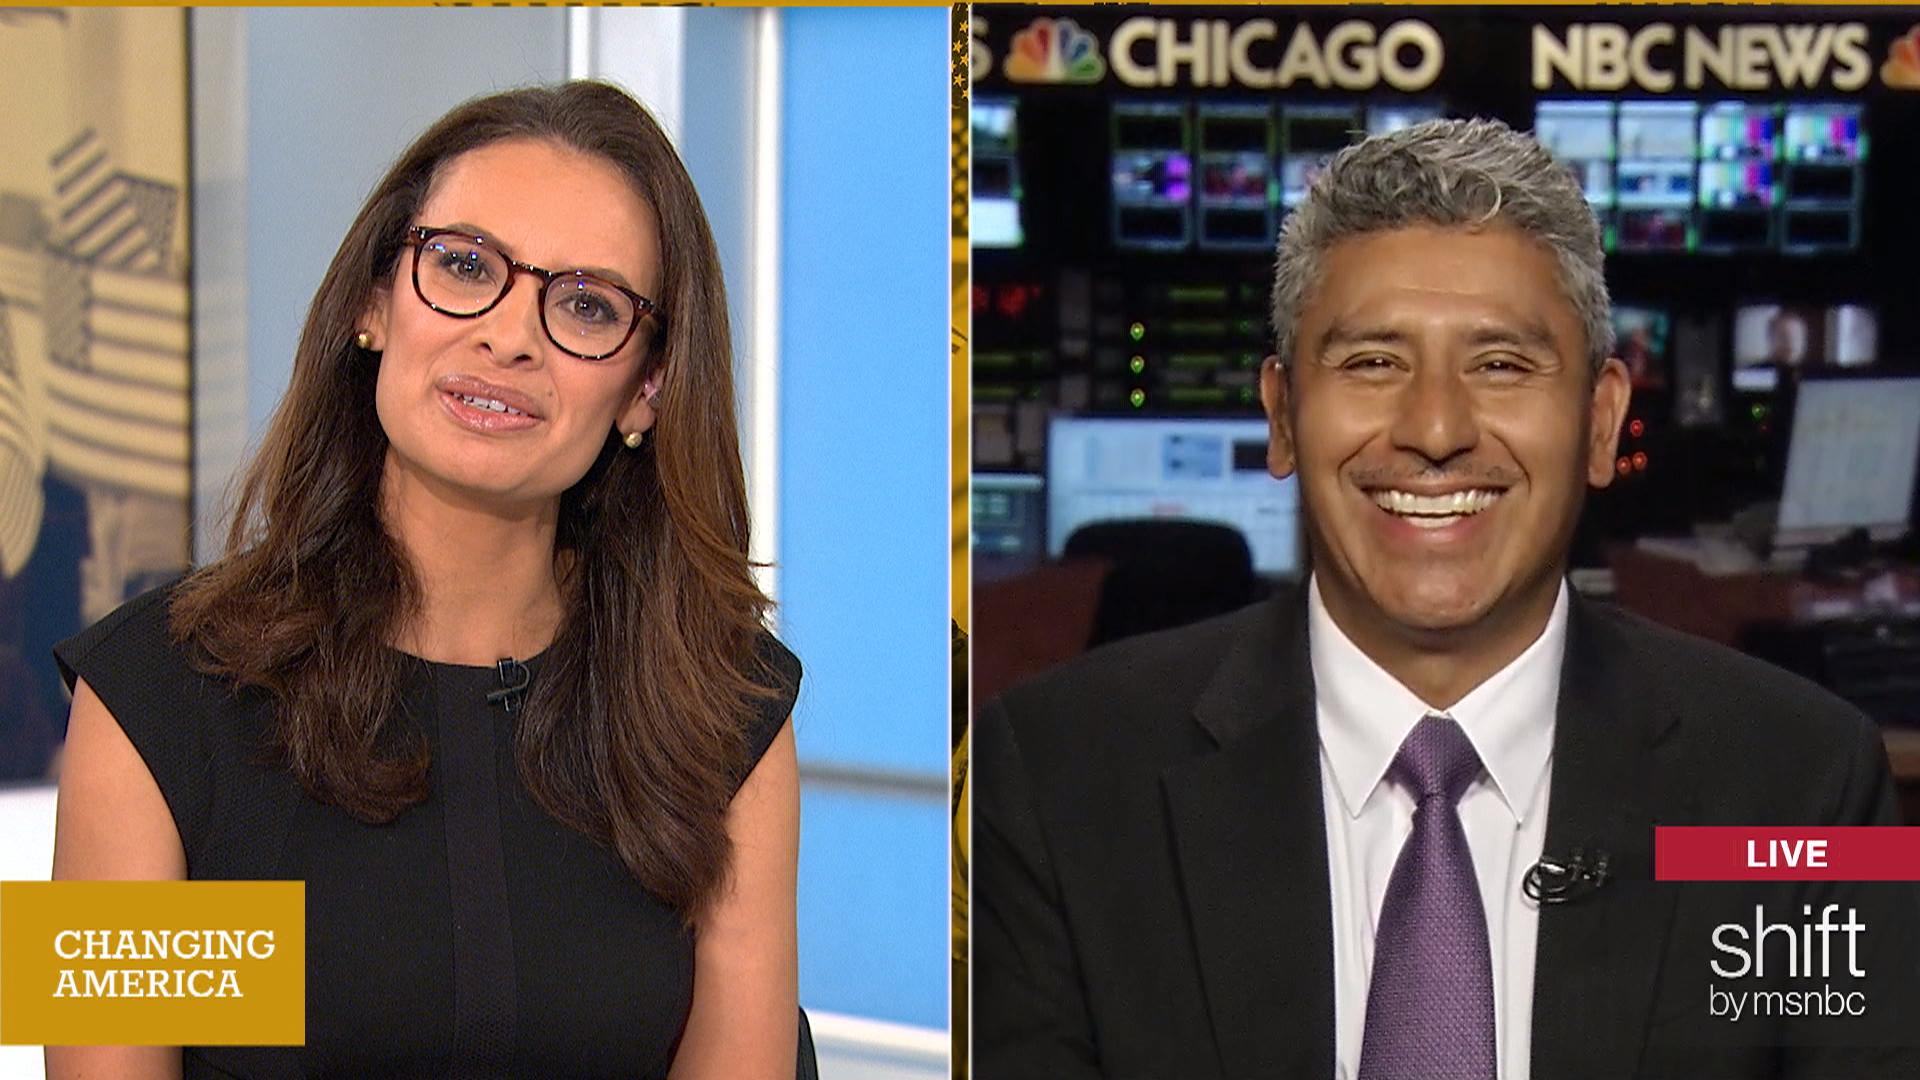 Latino community leader shocked by award